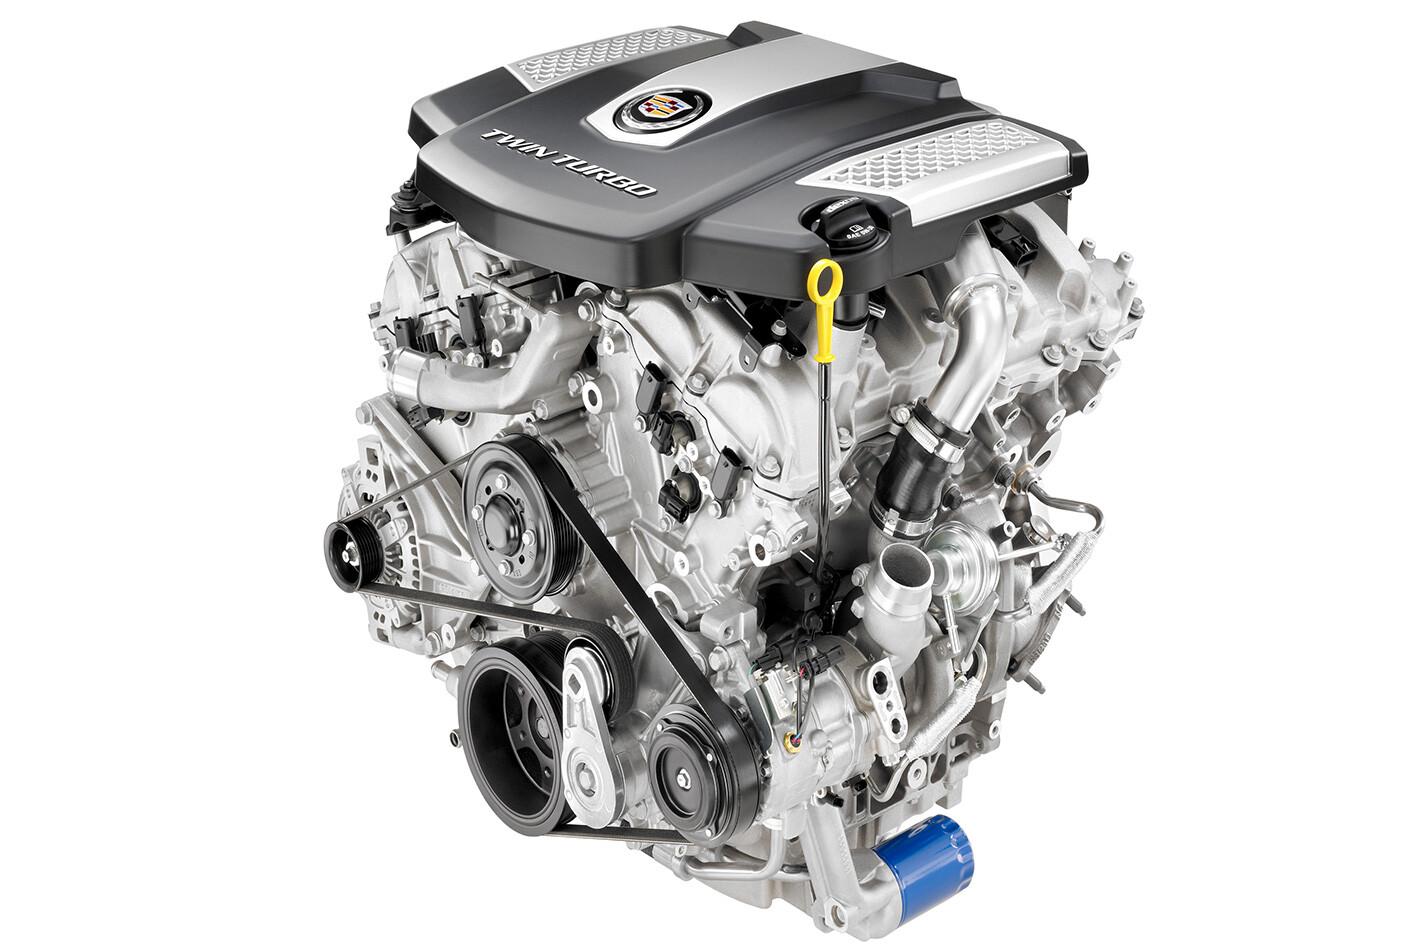 Holden-Walkinshaw-Colorado-engine.jpg